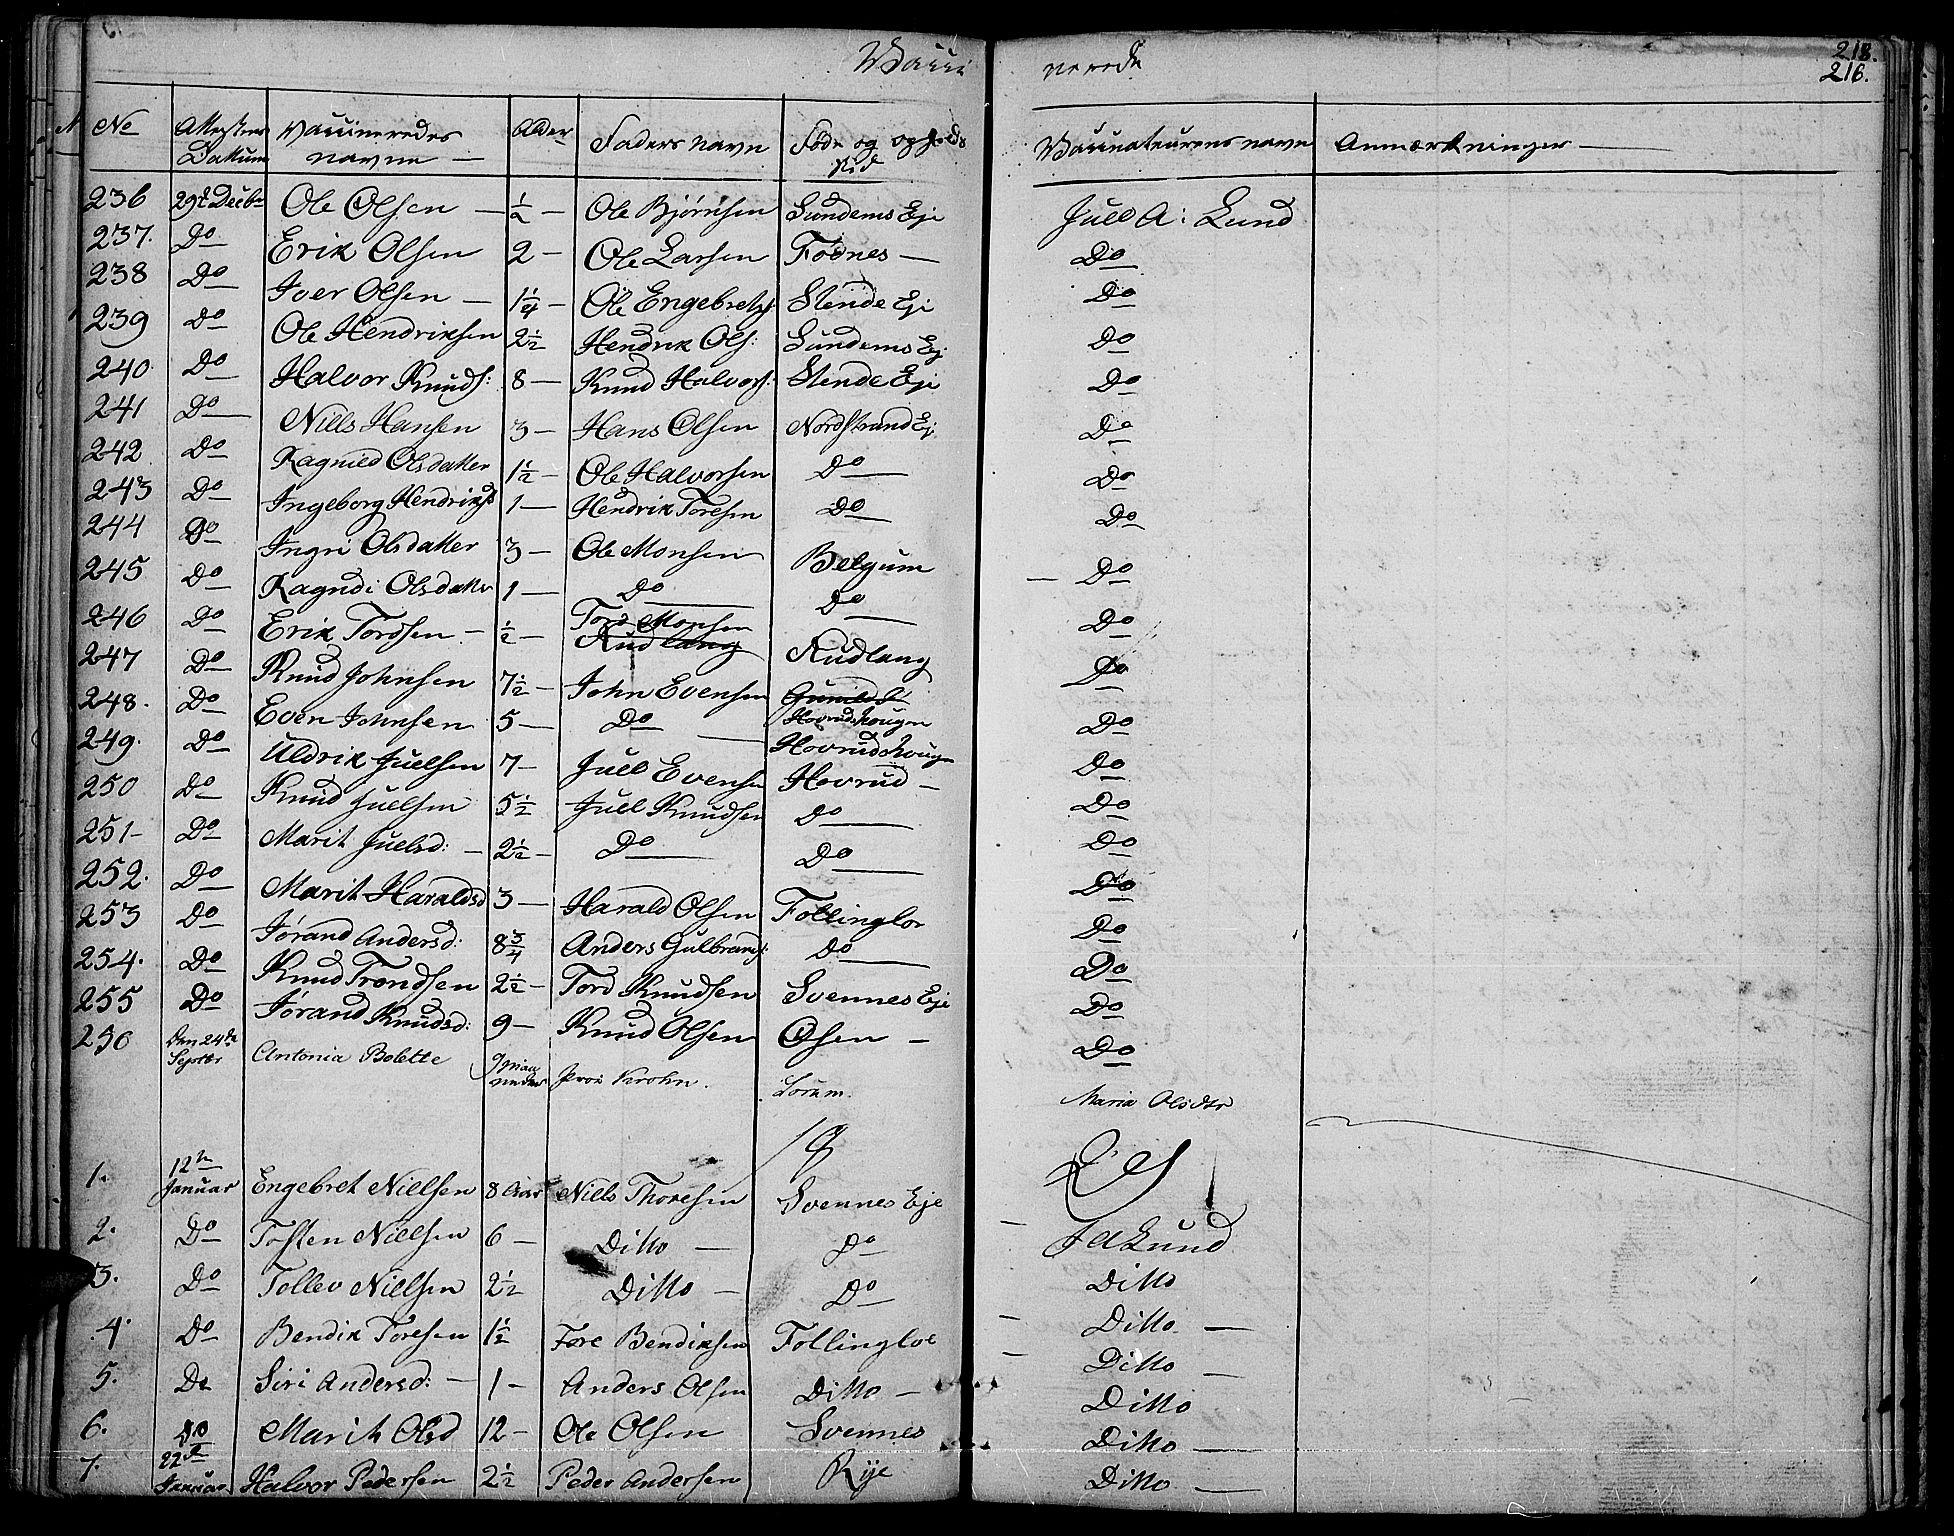 SAH, Nord-Aurdal prestekontor, Ministerialbok nr. 3, 1828-1841, s. 216